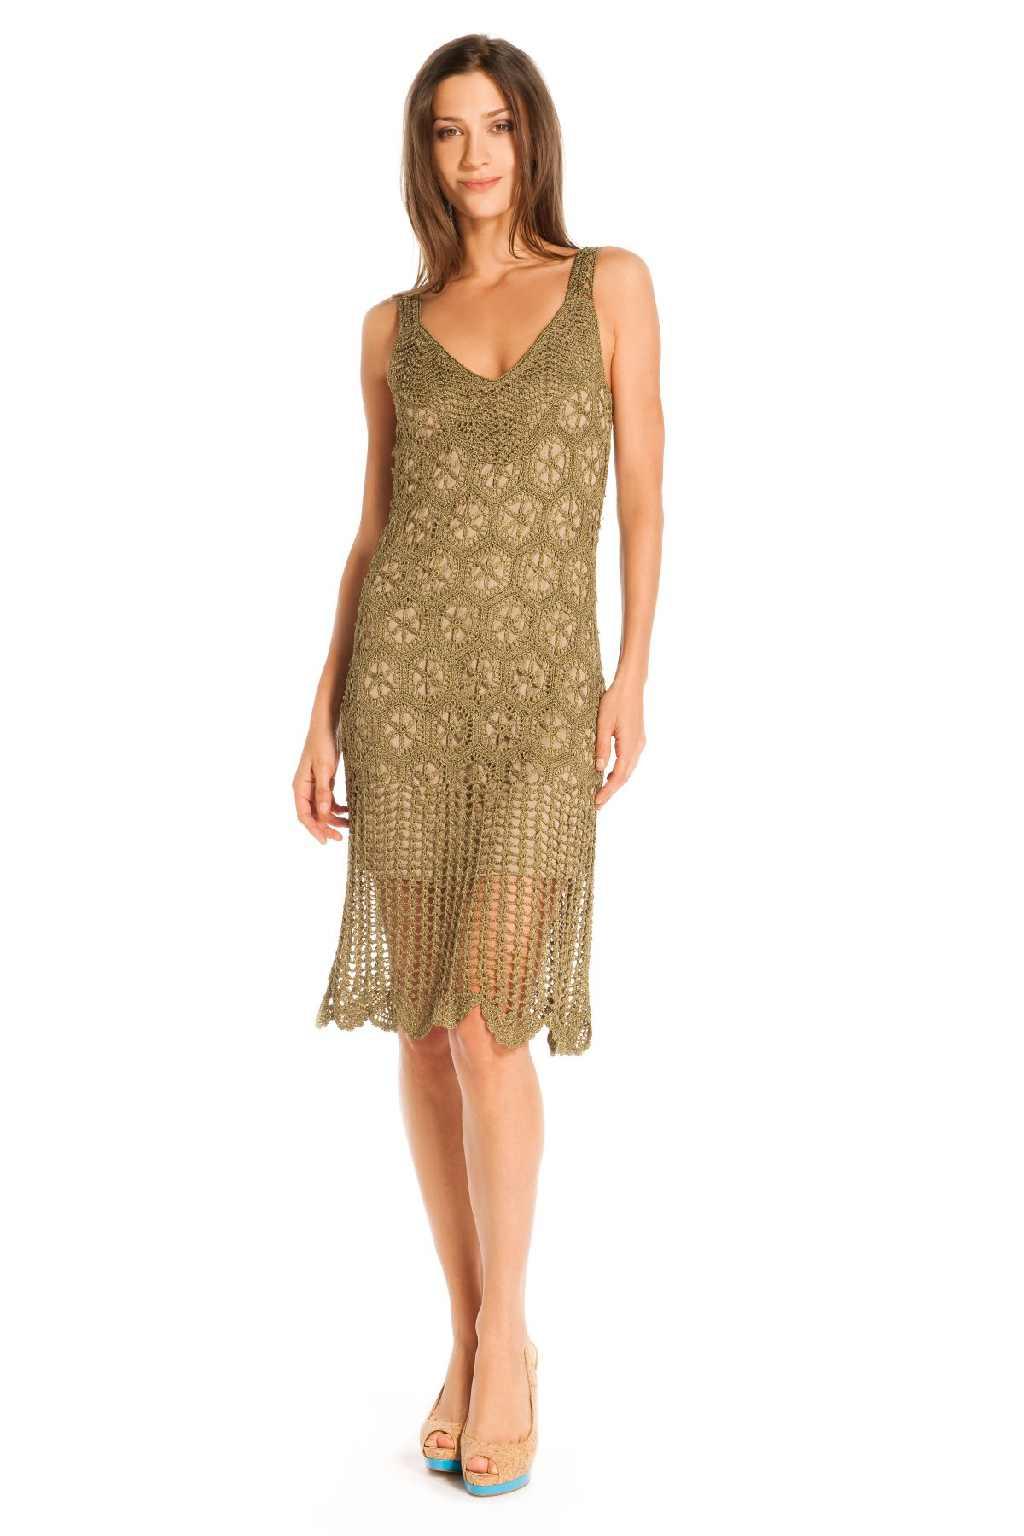 Crinochet Beautiful Crochet Dresses For Inspiration